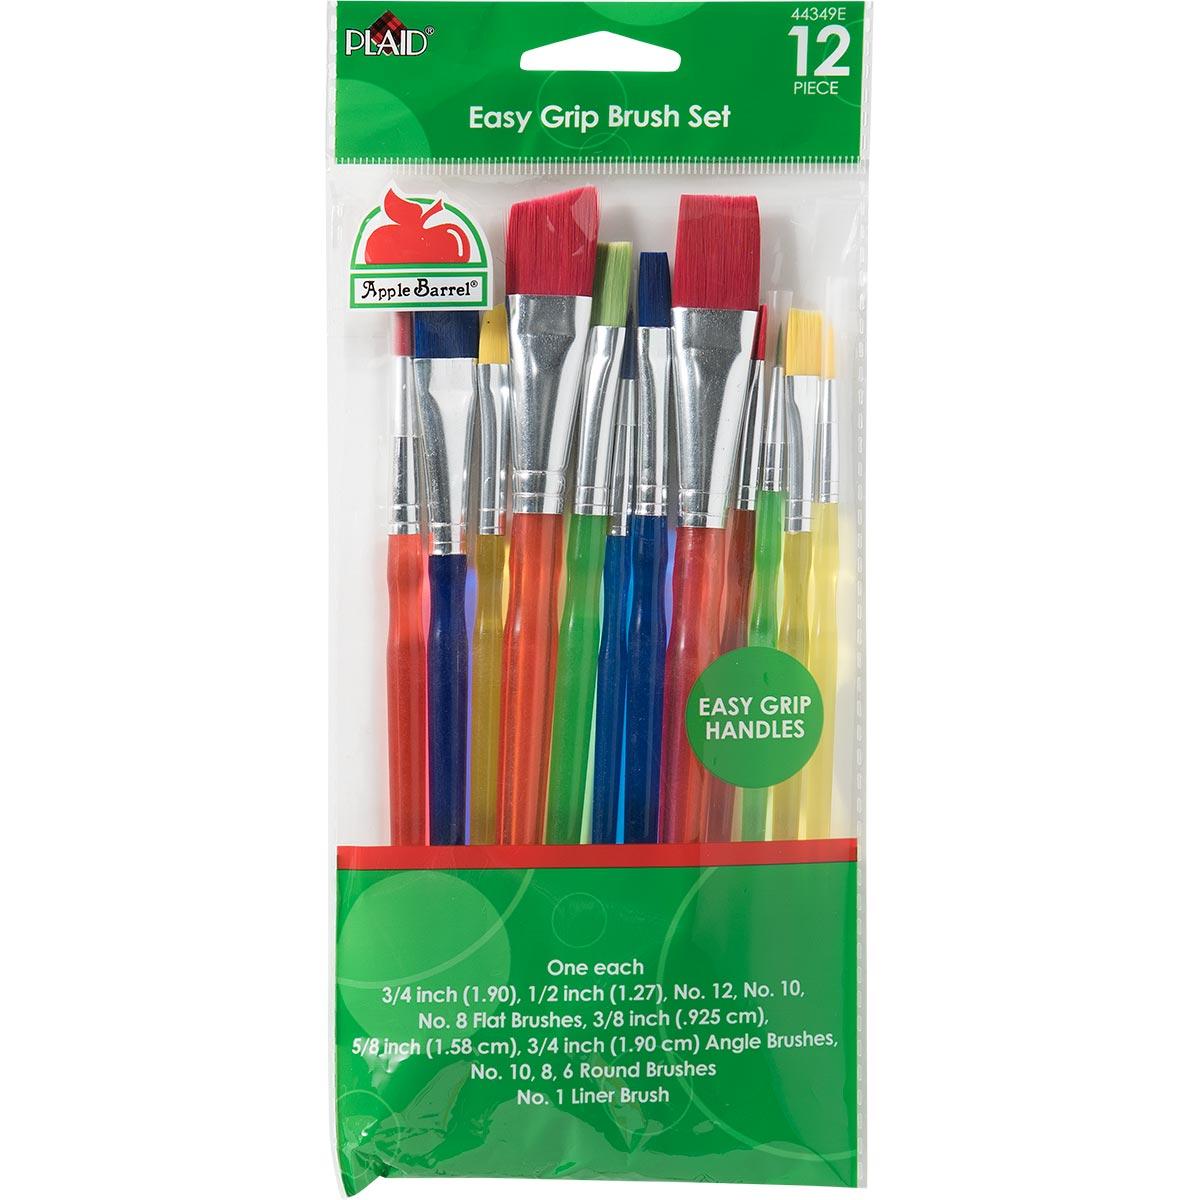 Apple Barrel ® Brush Sets - Easy Grip Set, 12 pc. - 44349E